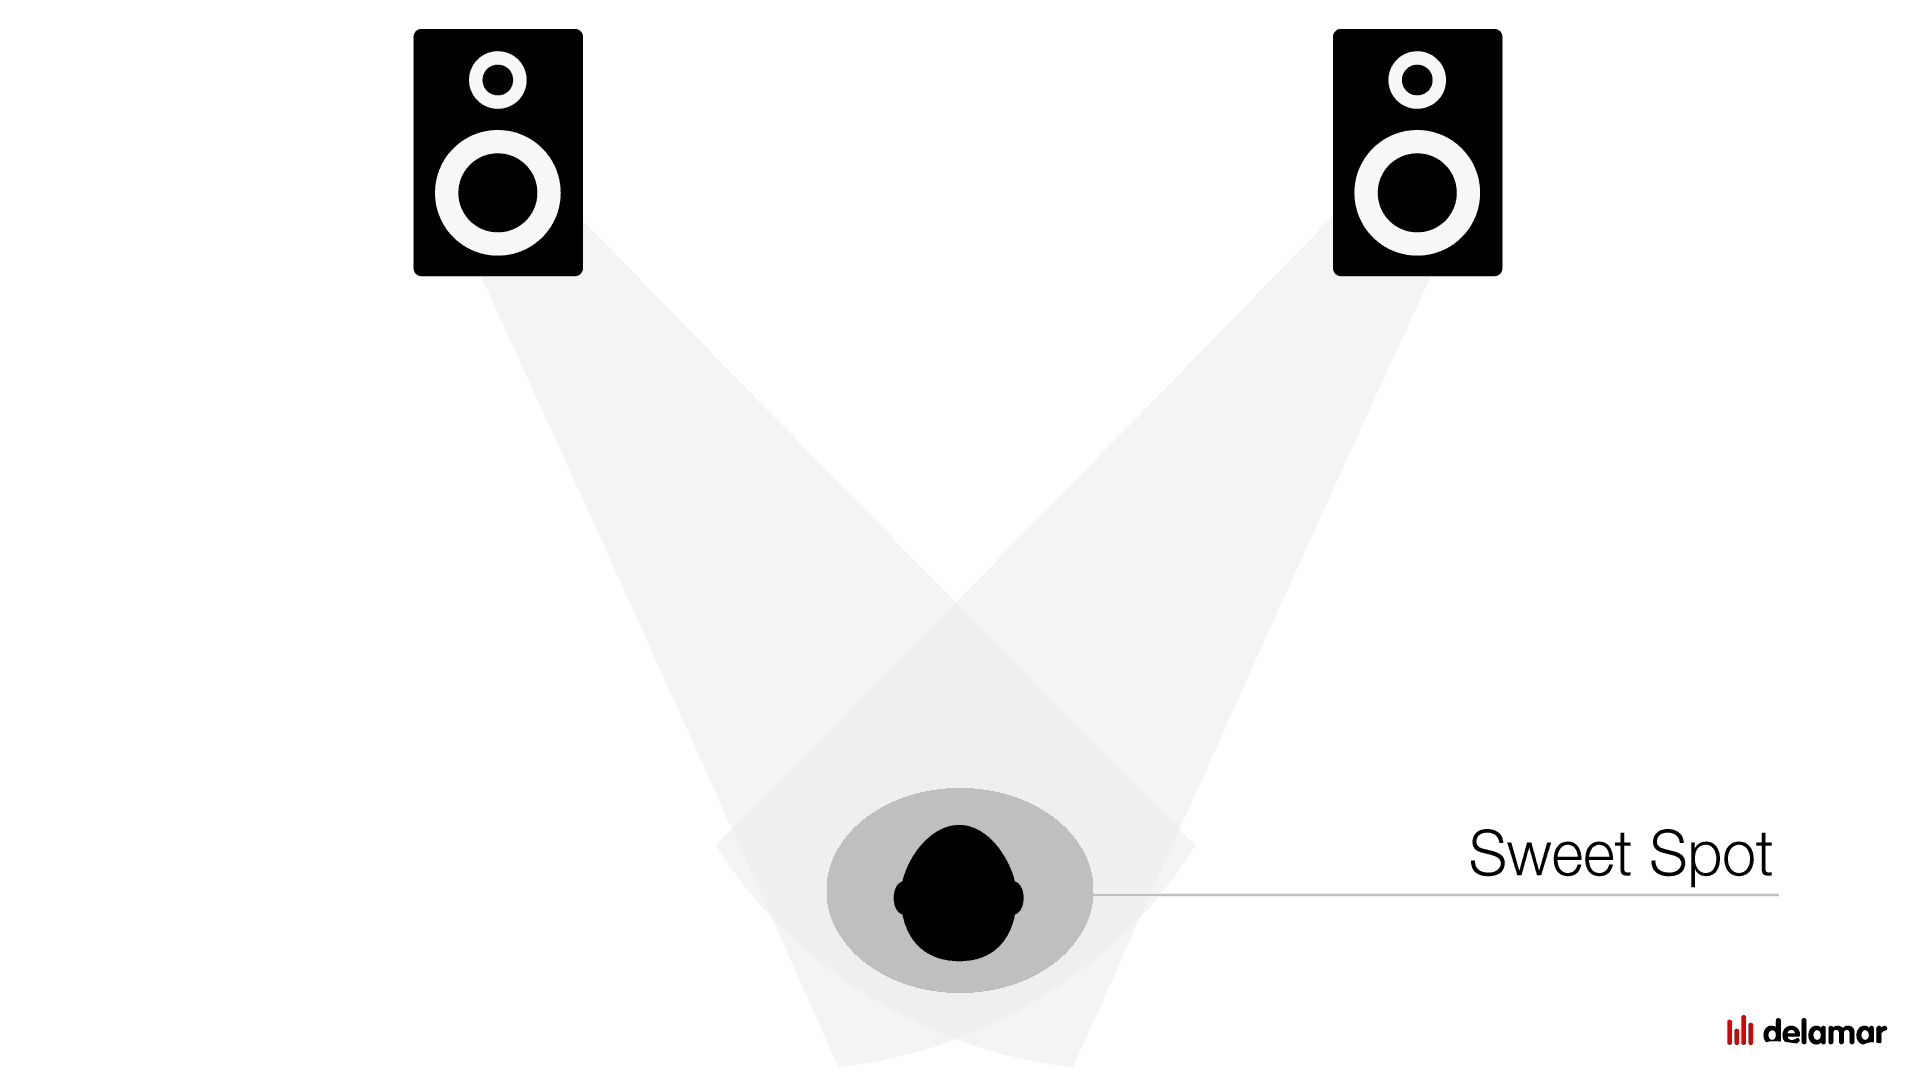 Sweet Spot bei der Lautsprecher-Aufstellung